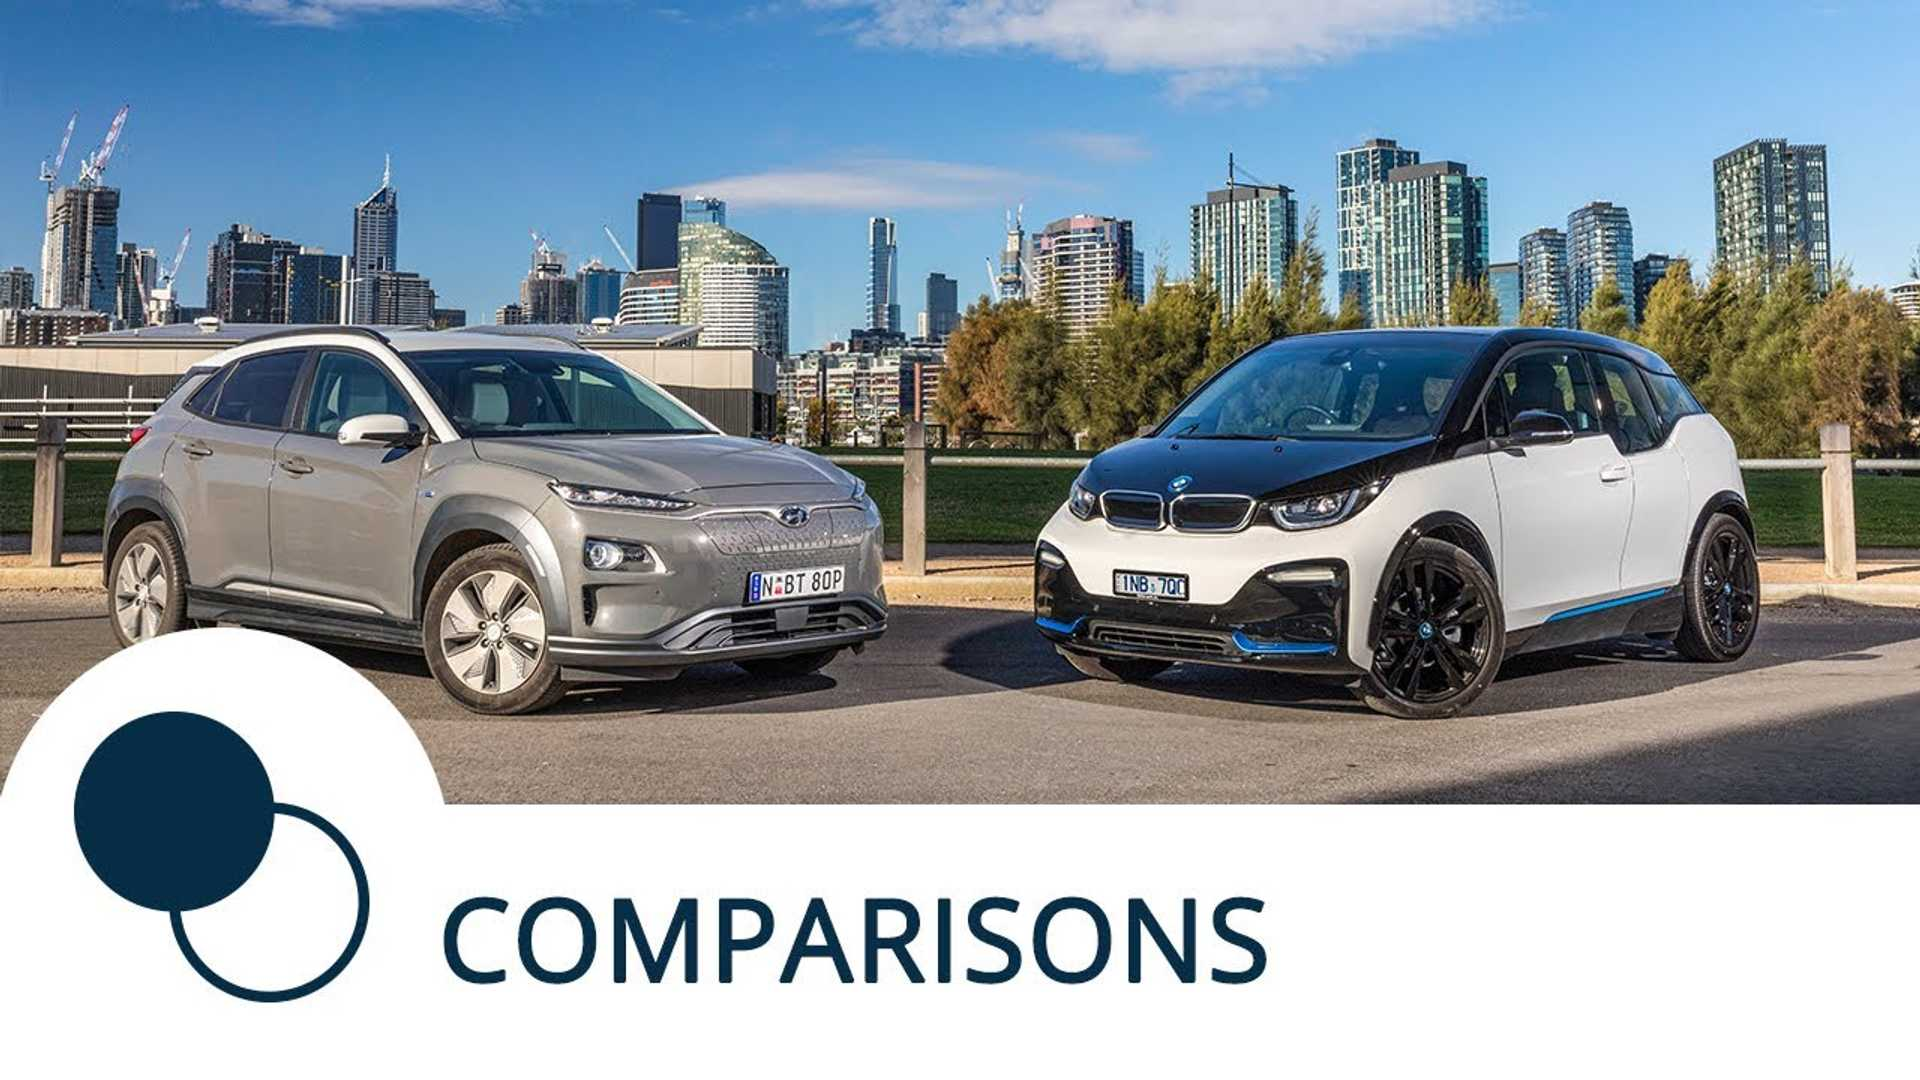 Hyundai Kona Electric Vs BMW i3s: EV Crossover Comparison